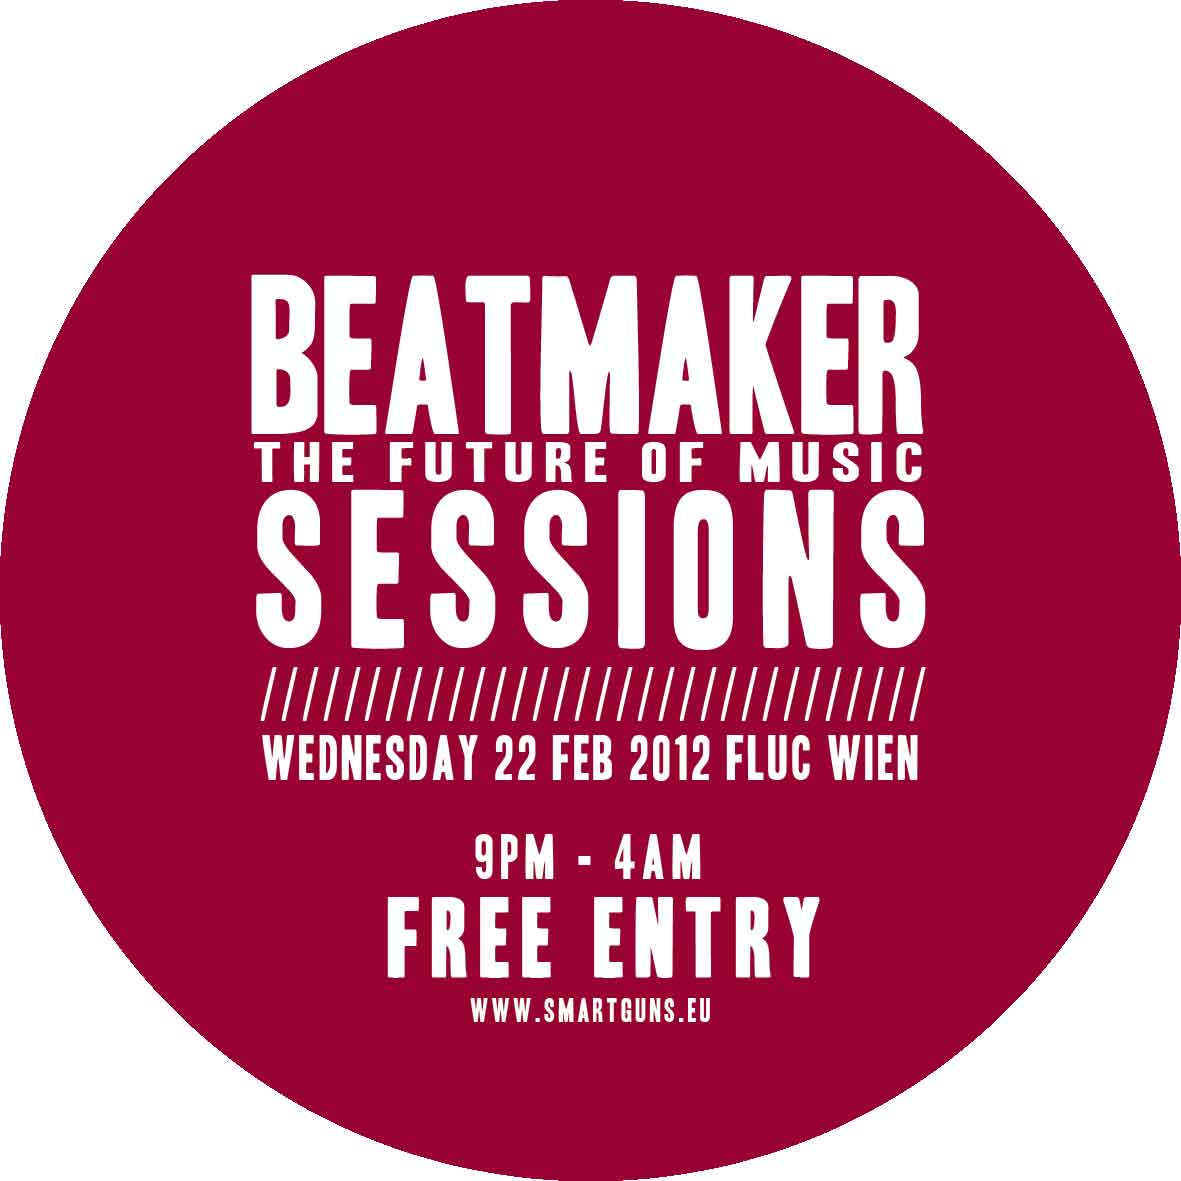 beatmaker-22.02.2012-web-front